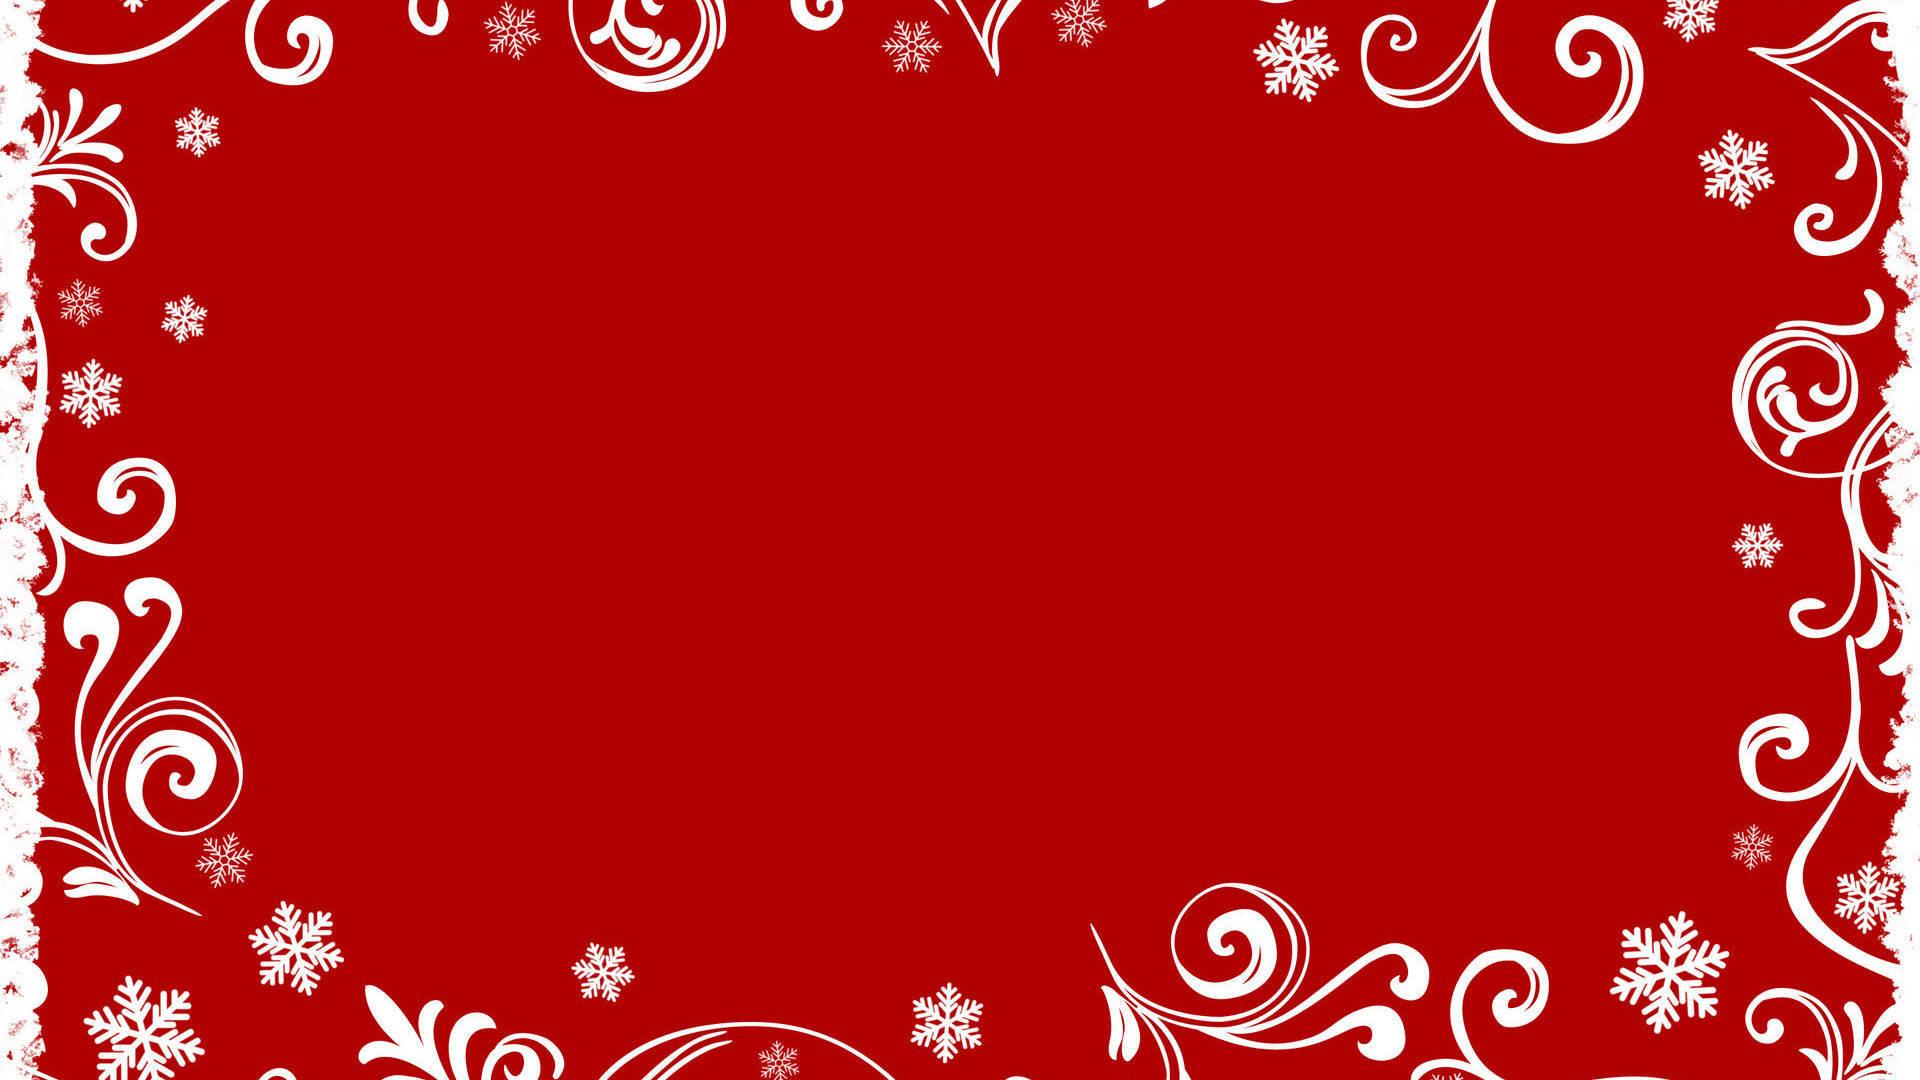 Christmas succinct theme red wallpaper HD wallpaper Background 1920x1080